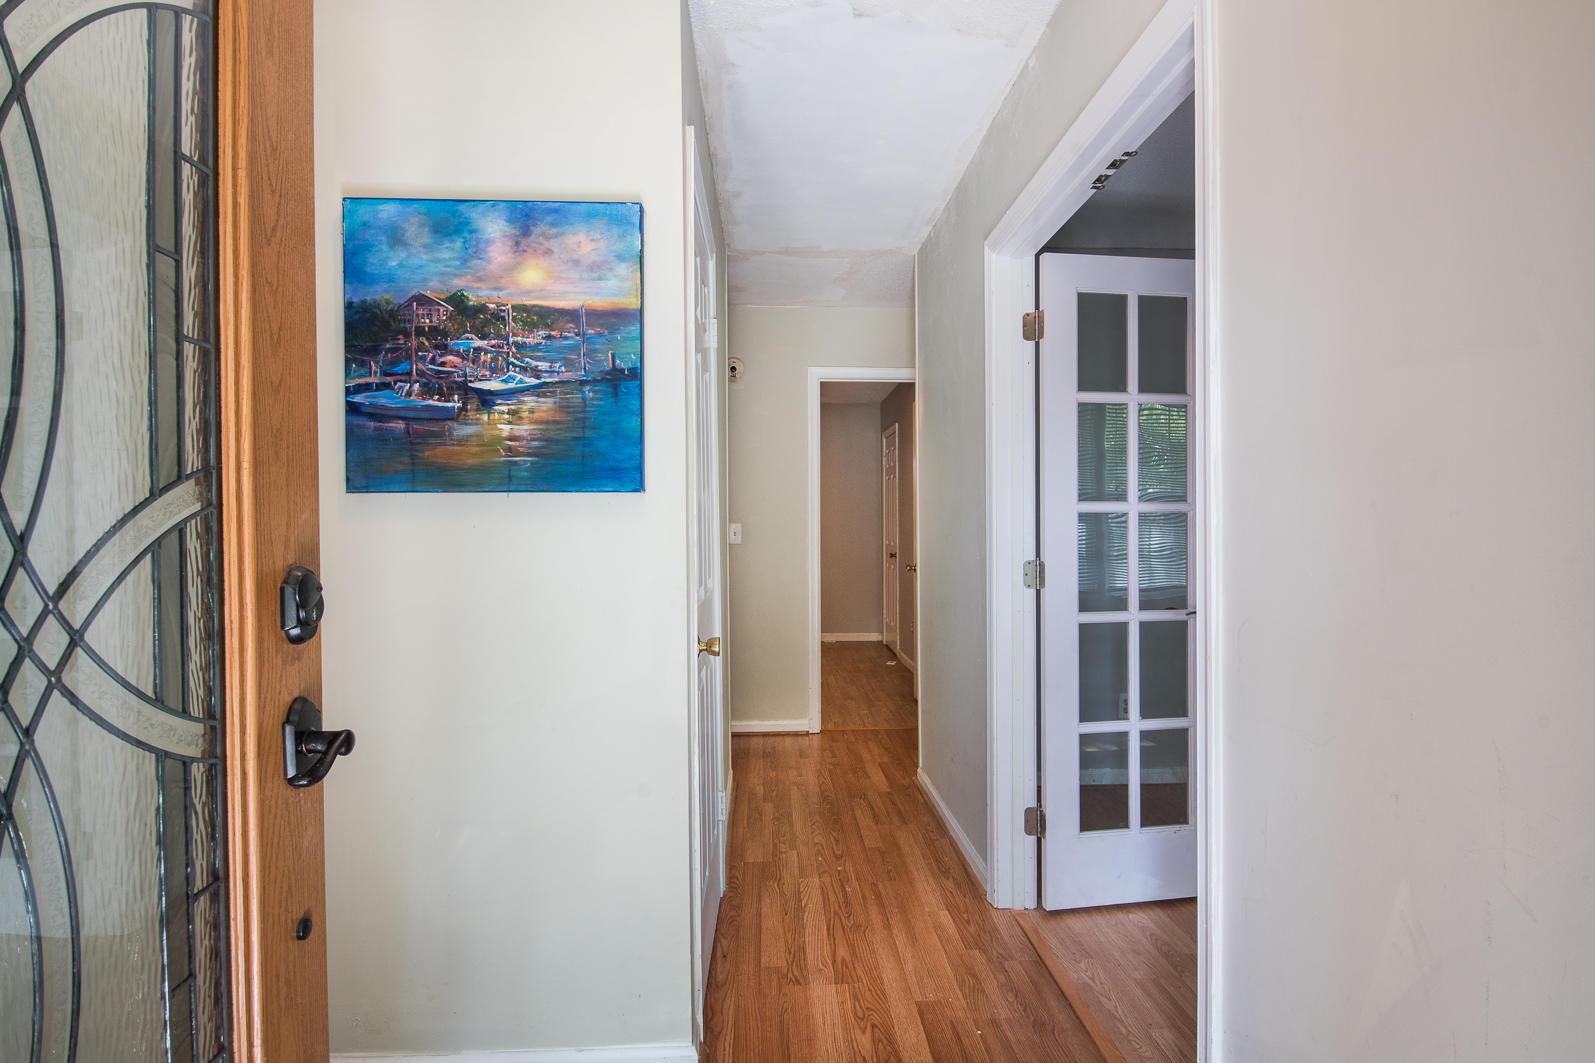 Wando East Homes For Sale - 1605 Babington, Mount Pleasant, SC - 33